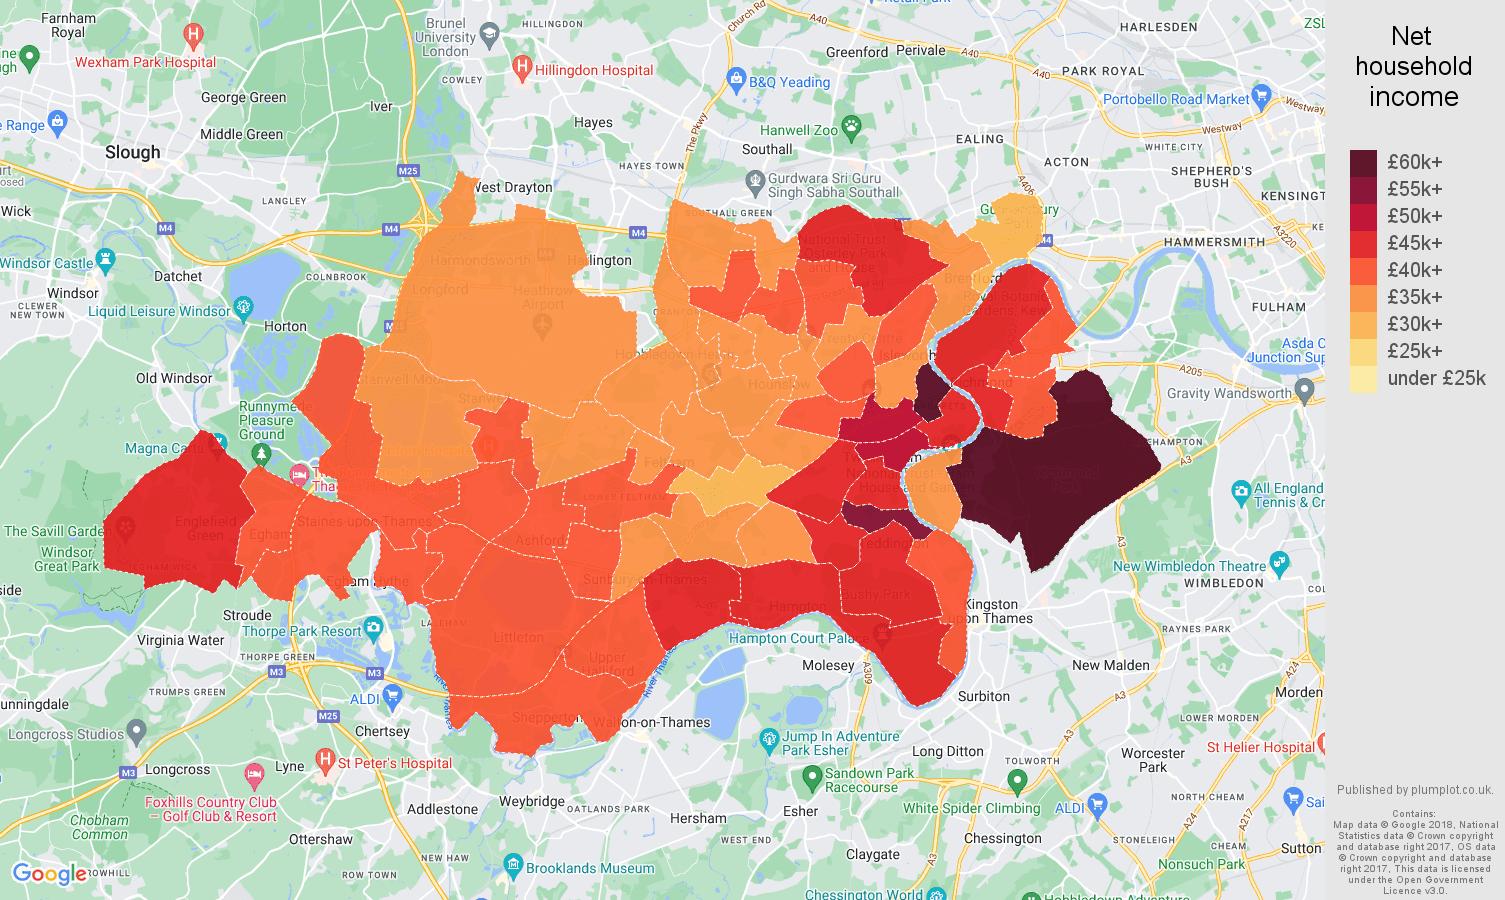 Twickenham net household income map